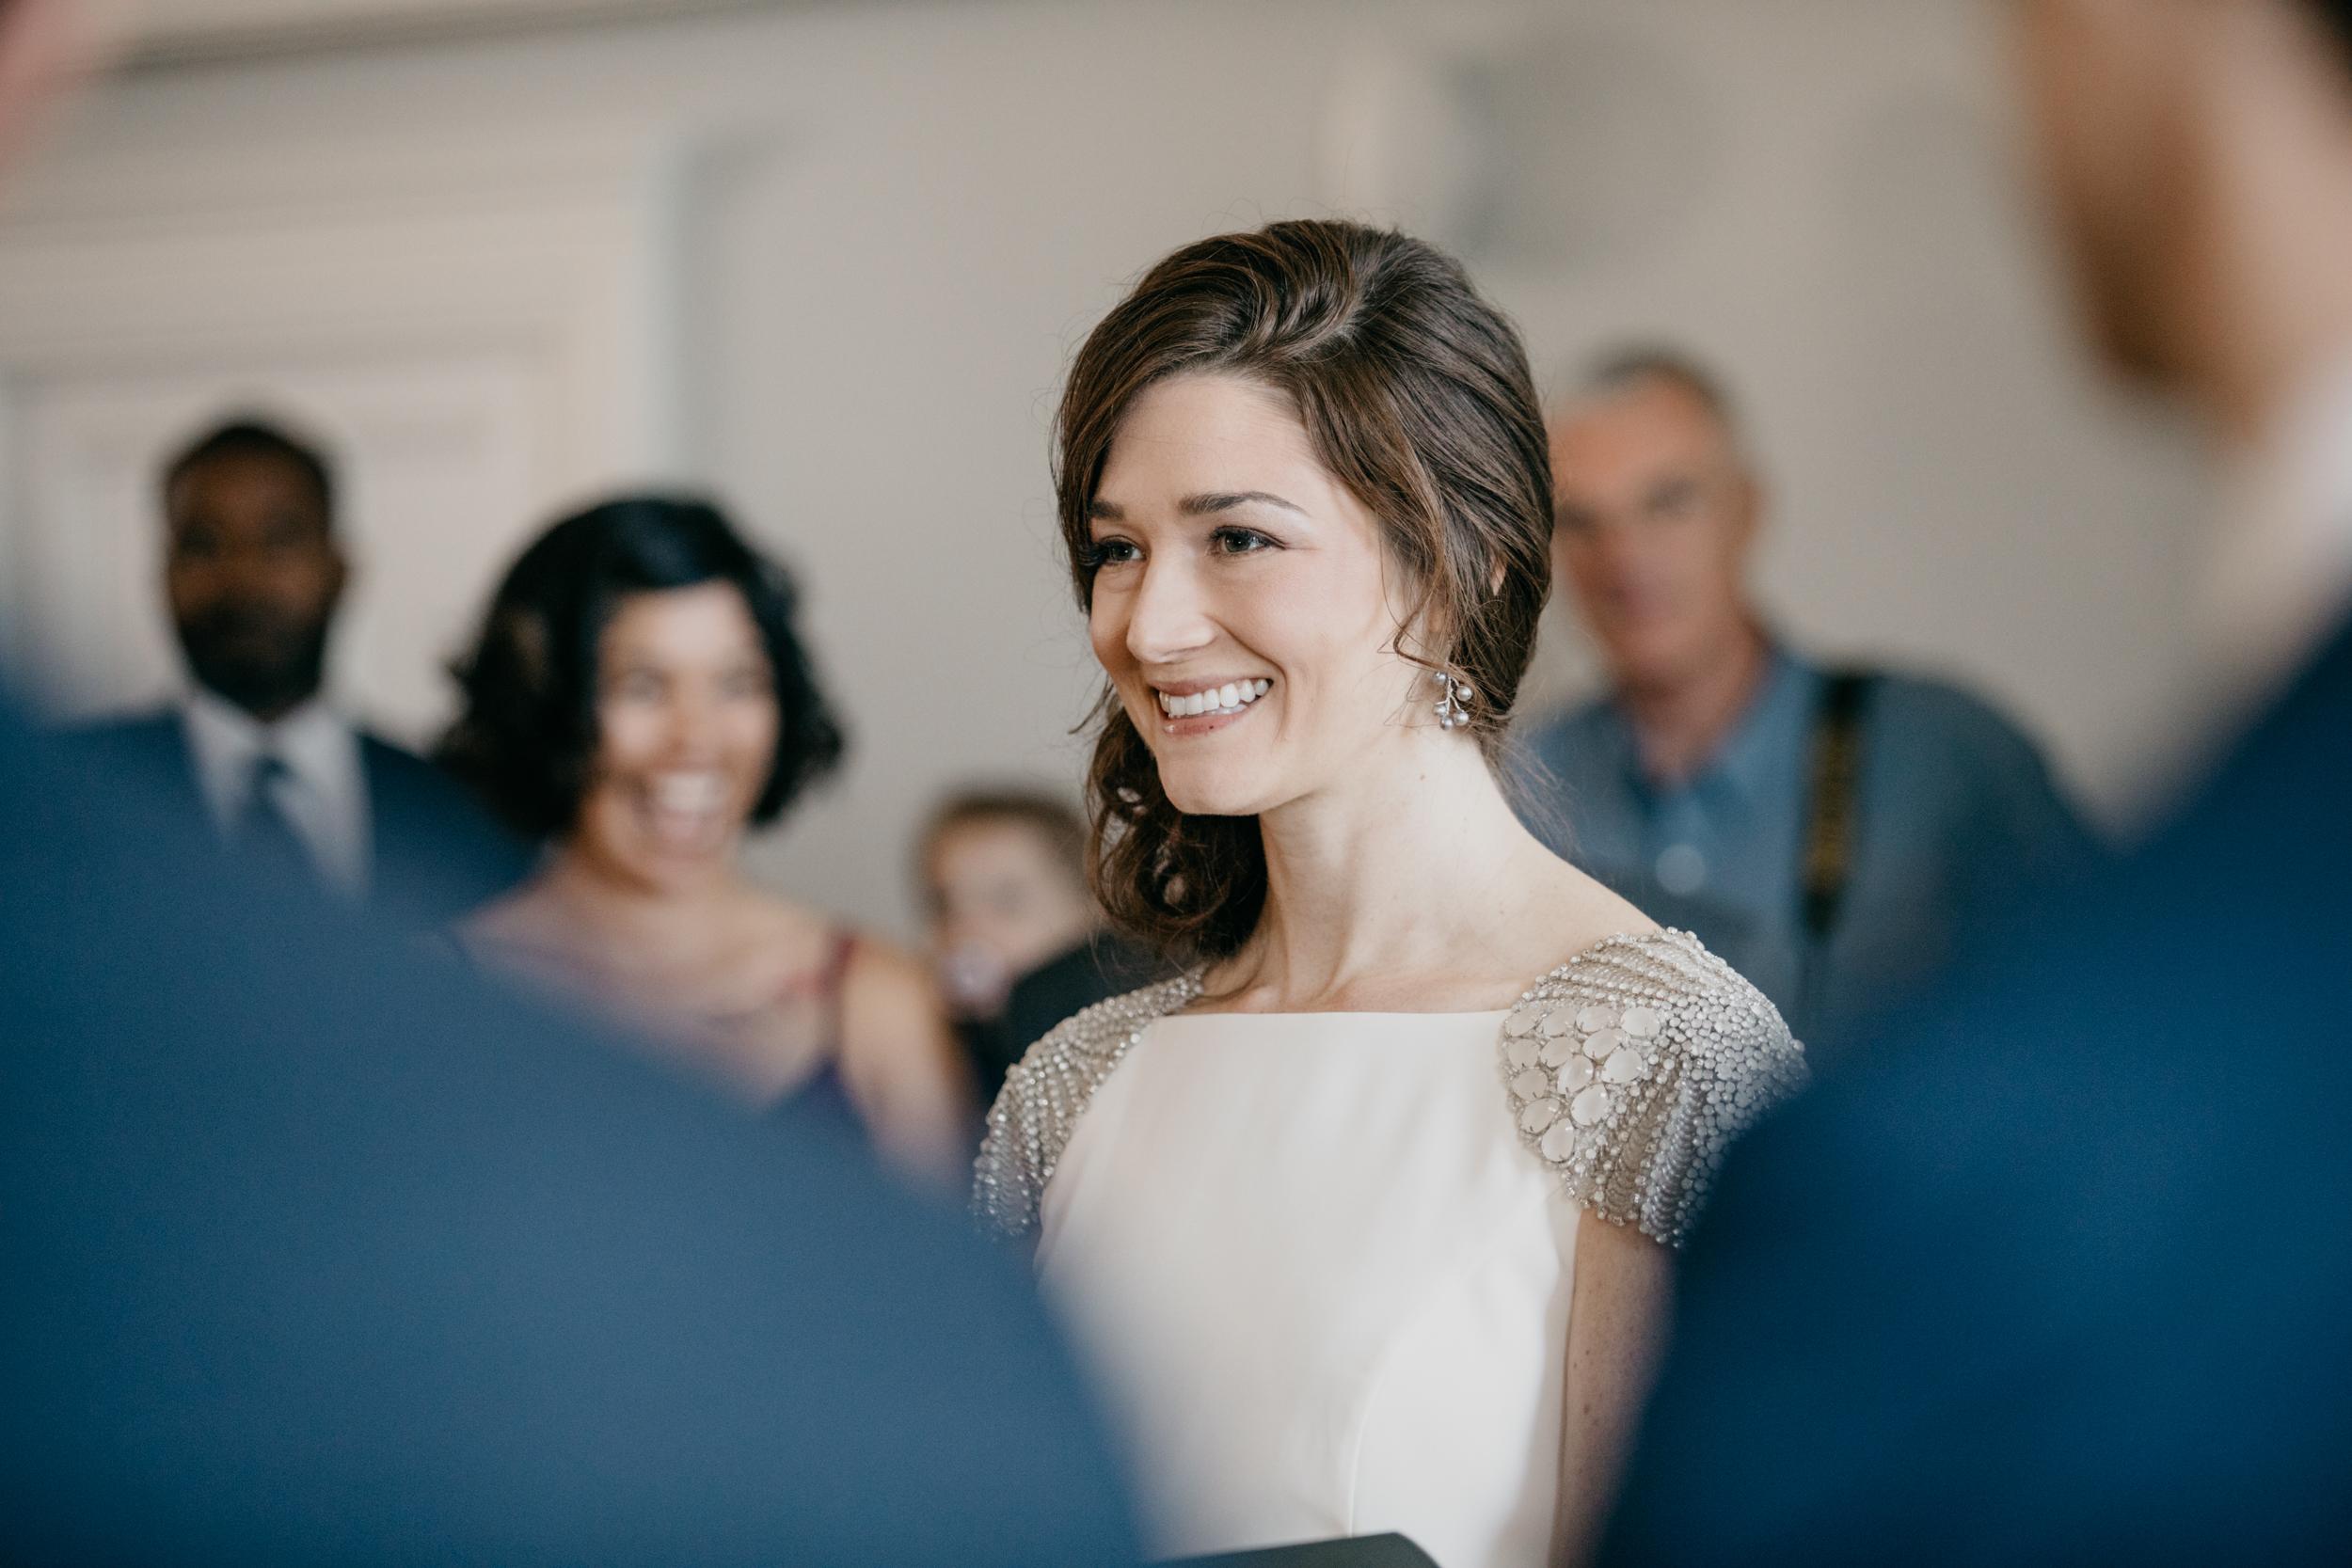 Mackenzie_Collins_Maine_wedding_in_Rockport_Union_hall_Nina_June_012.jpg